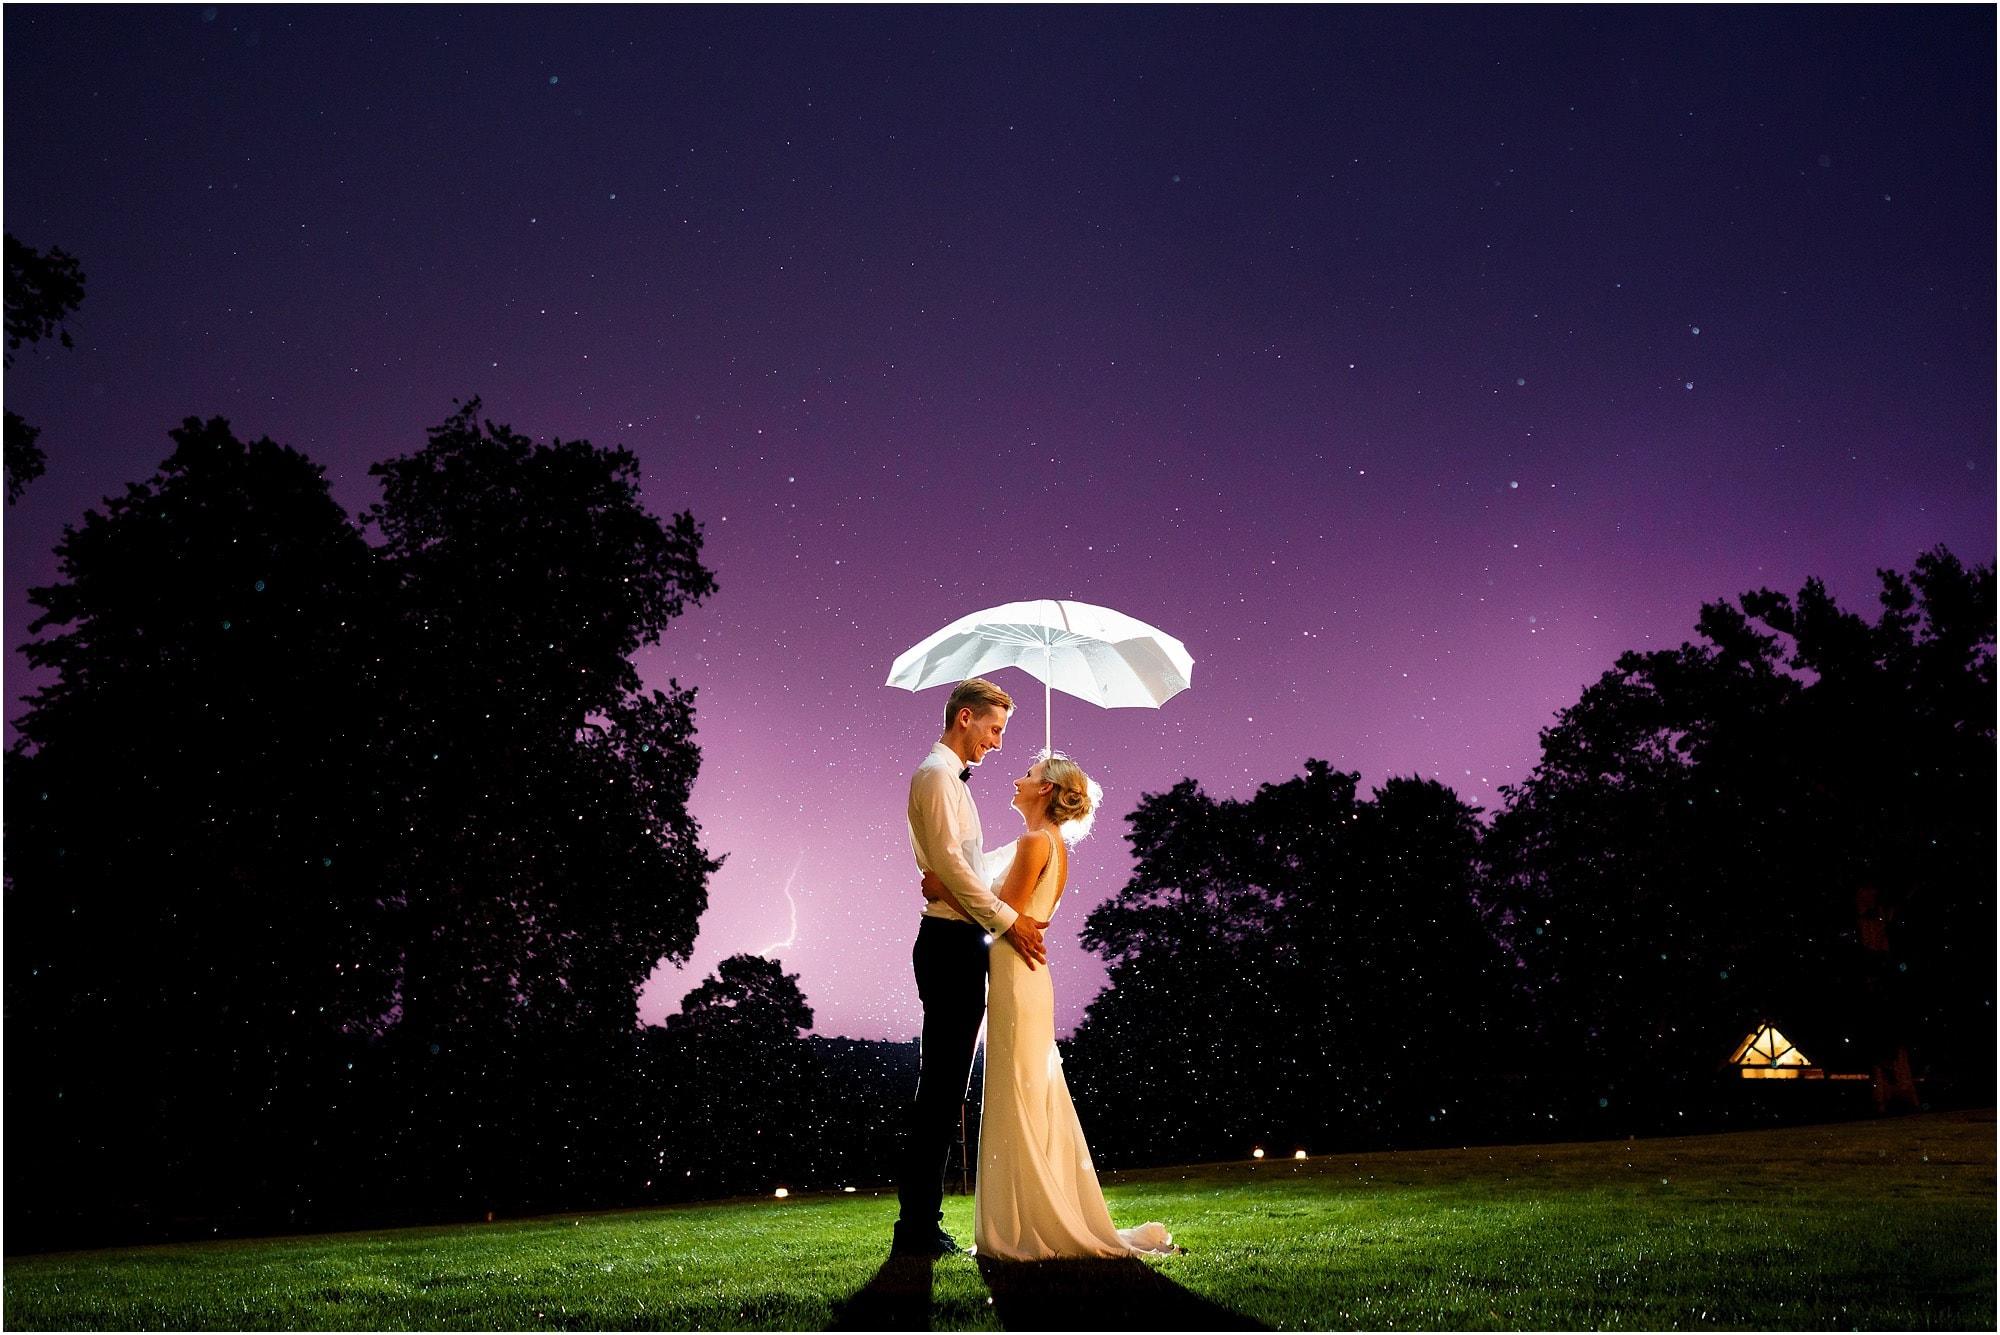 epic lightning wedding photo by a Maison Talbooth Wedding Photographer